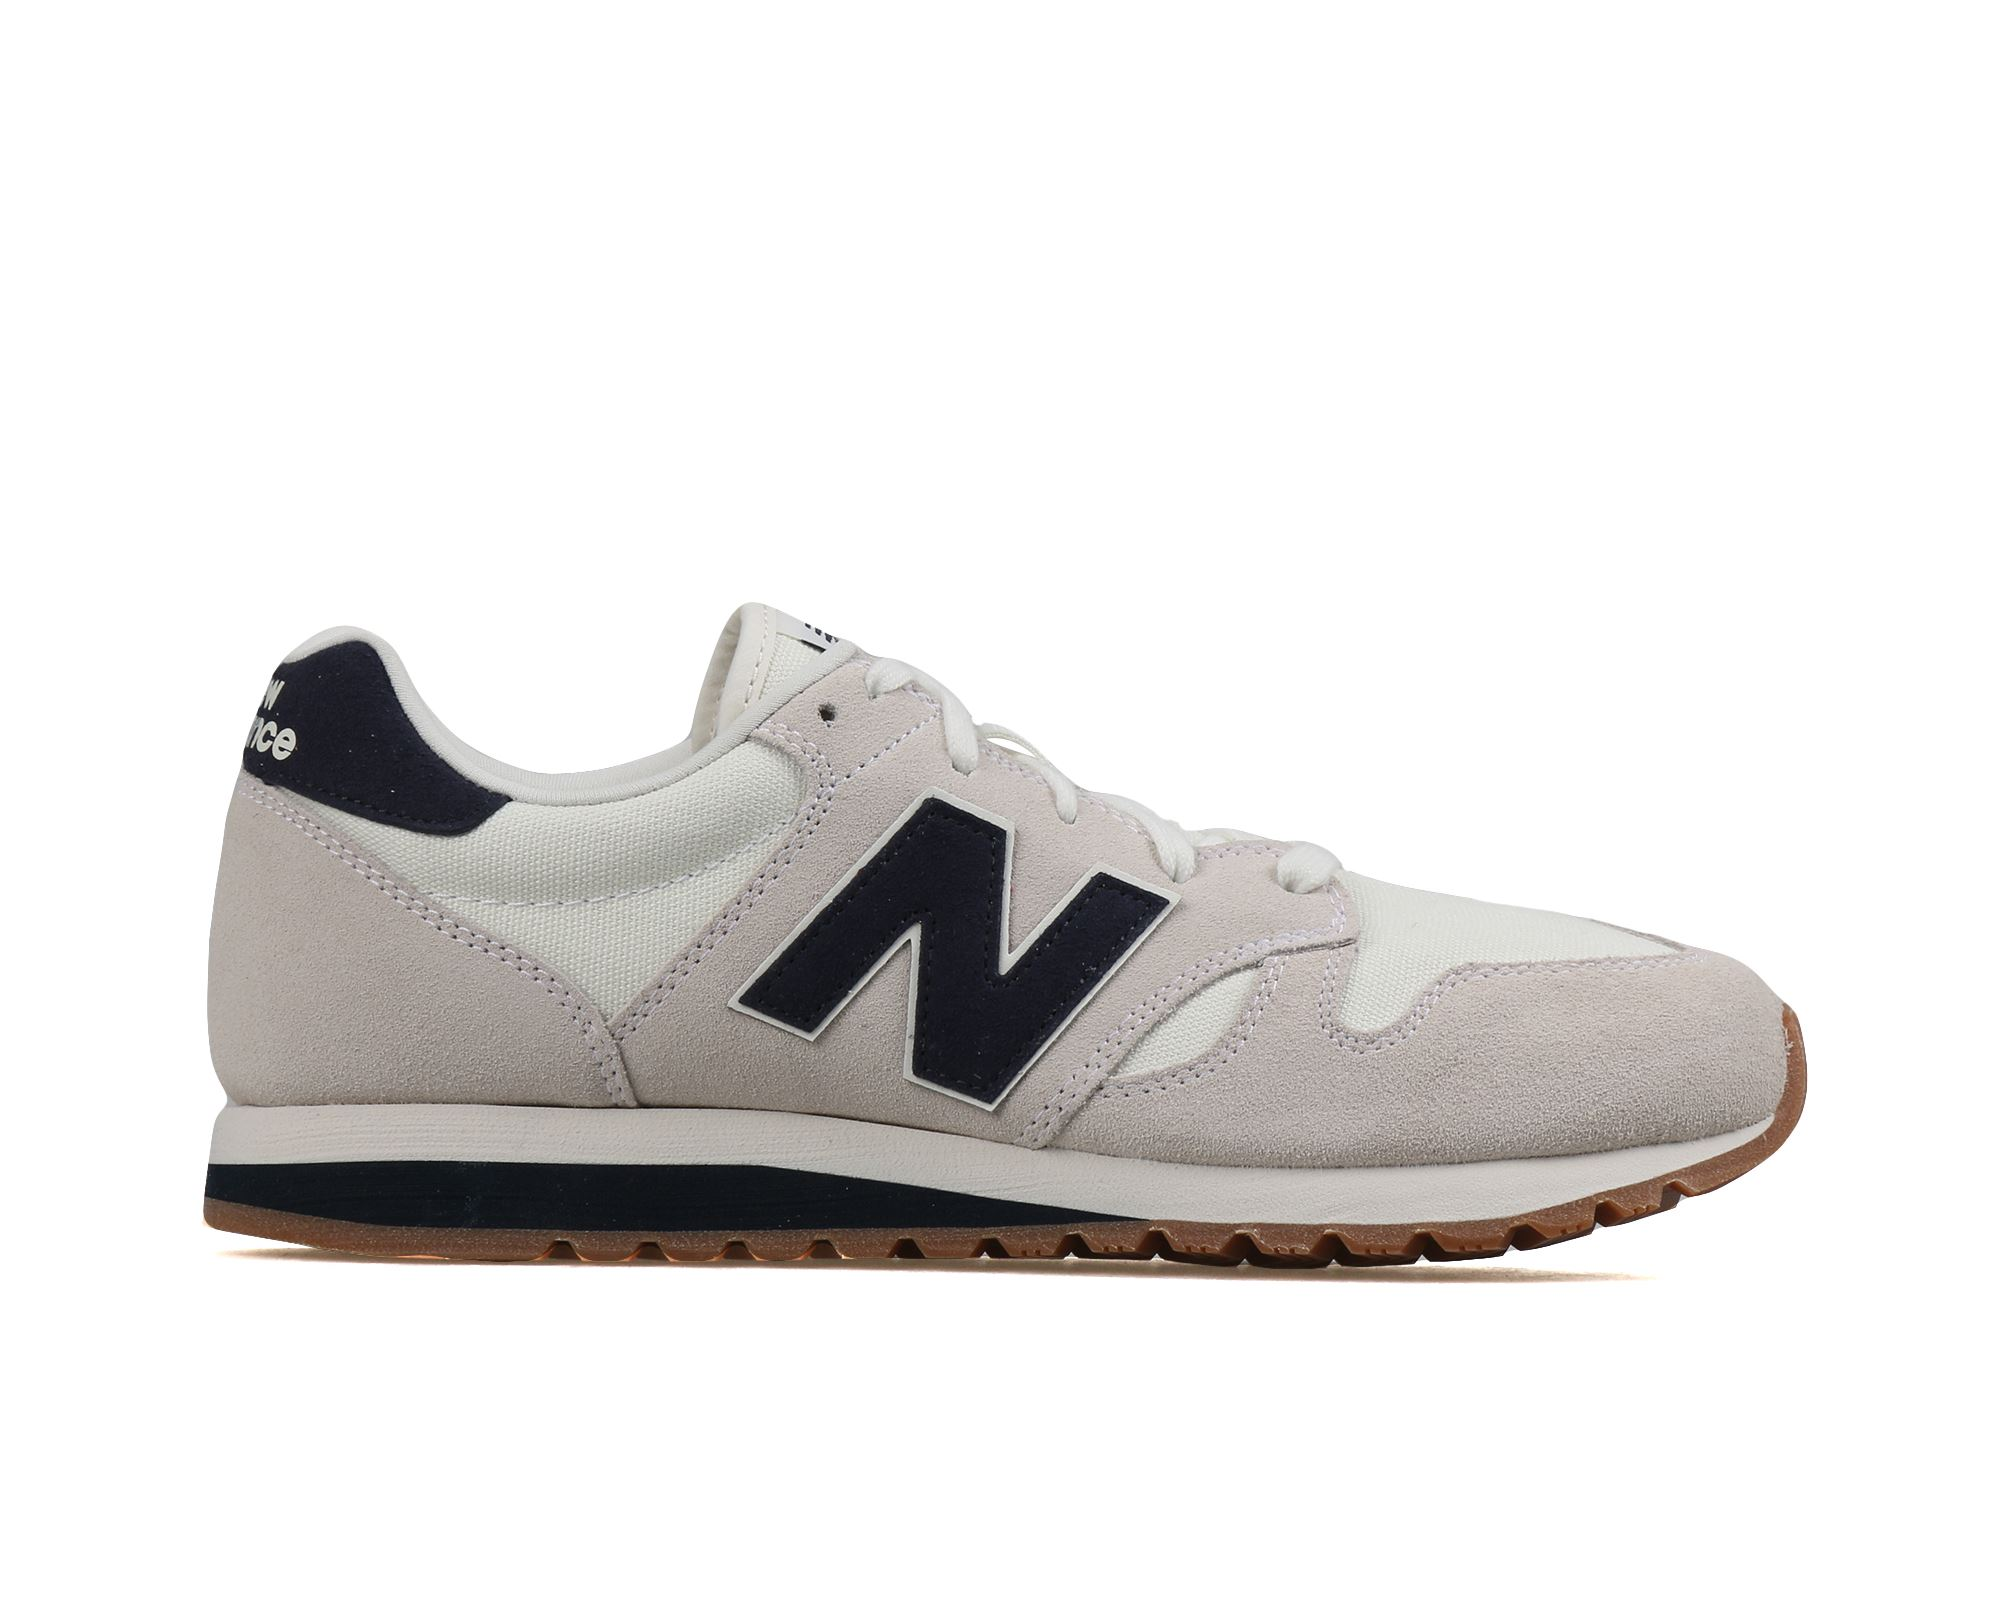 New Balance Krem Erkek Ayakkabısı U520CC U520Cc